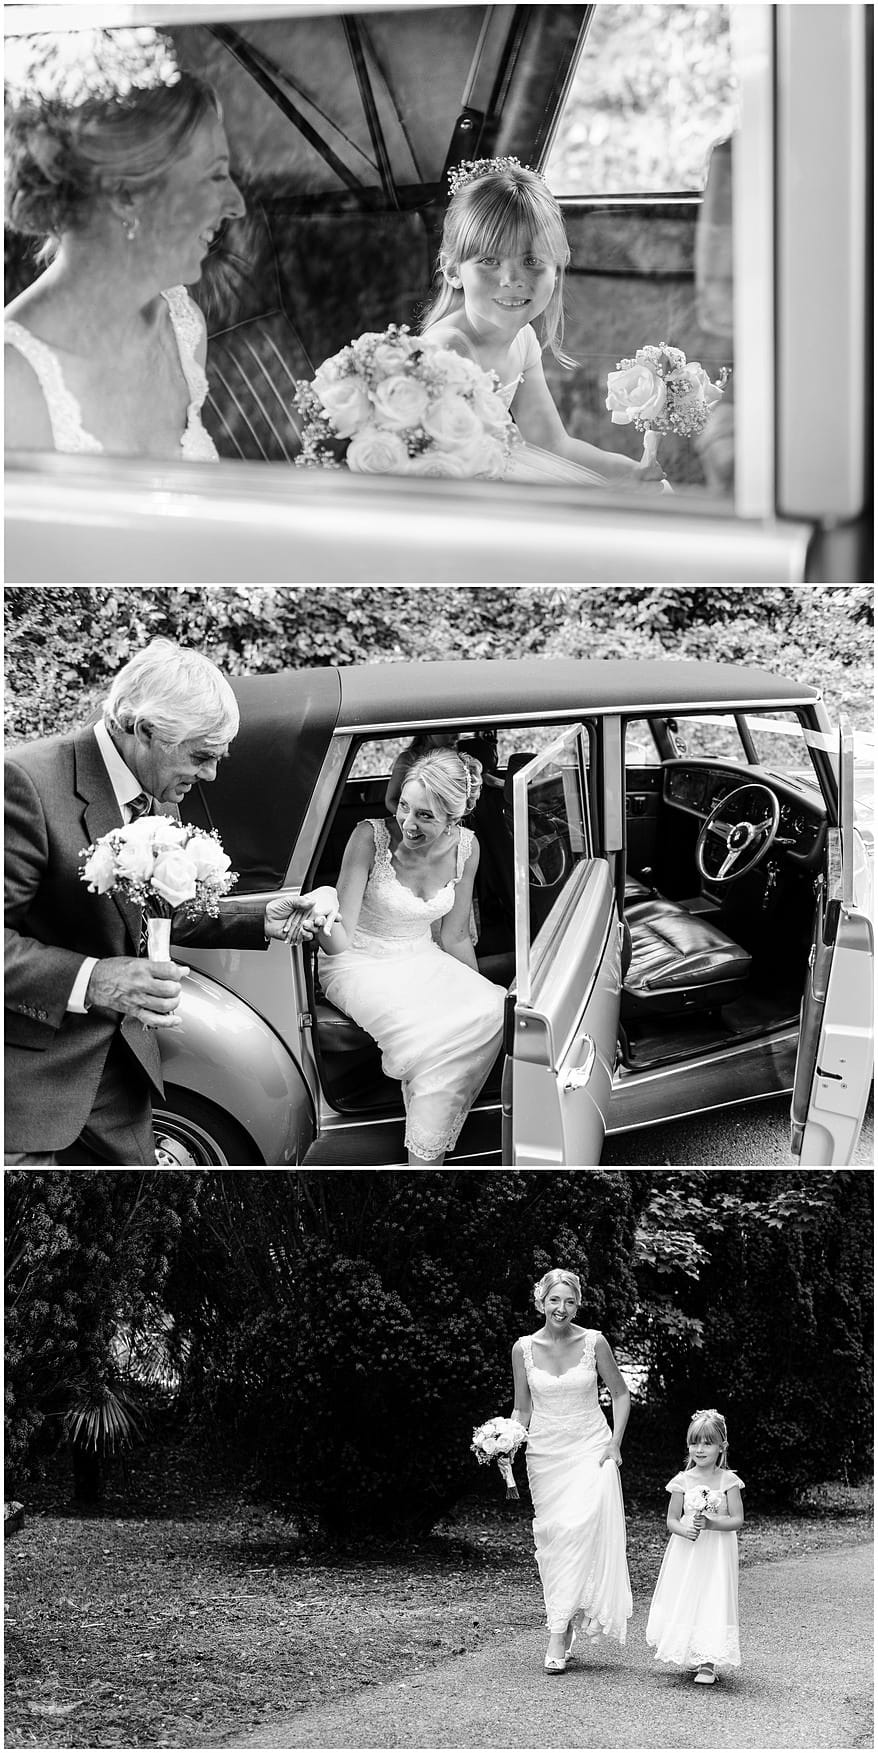 Bride arriving for her wedding at St Mewan Church